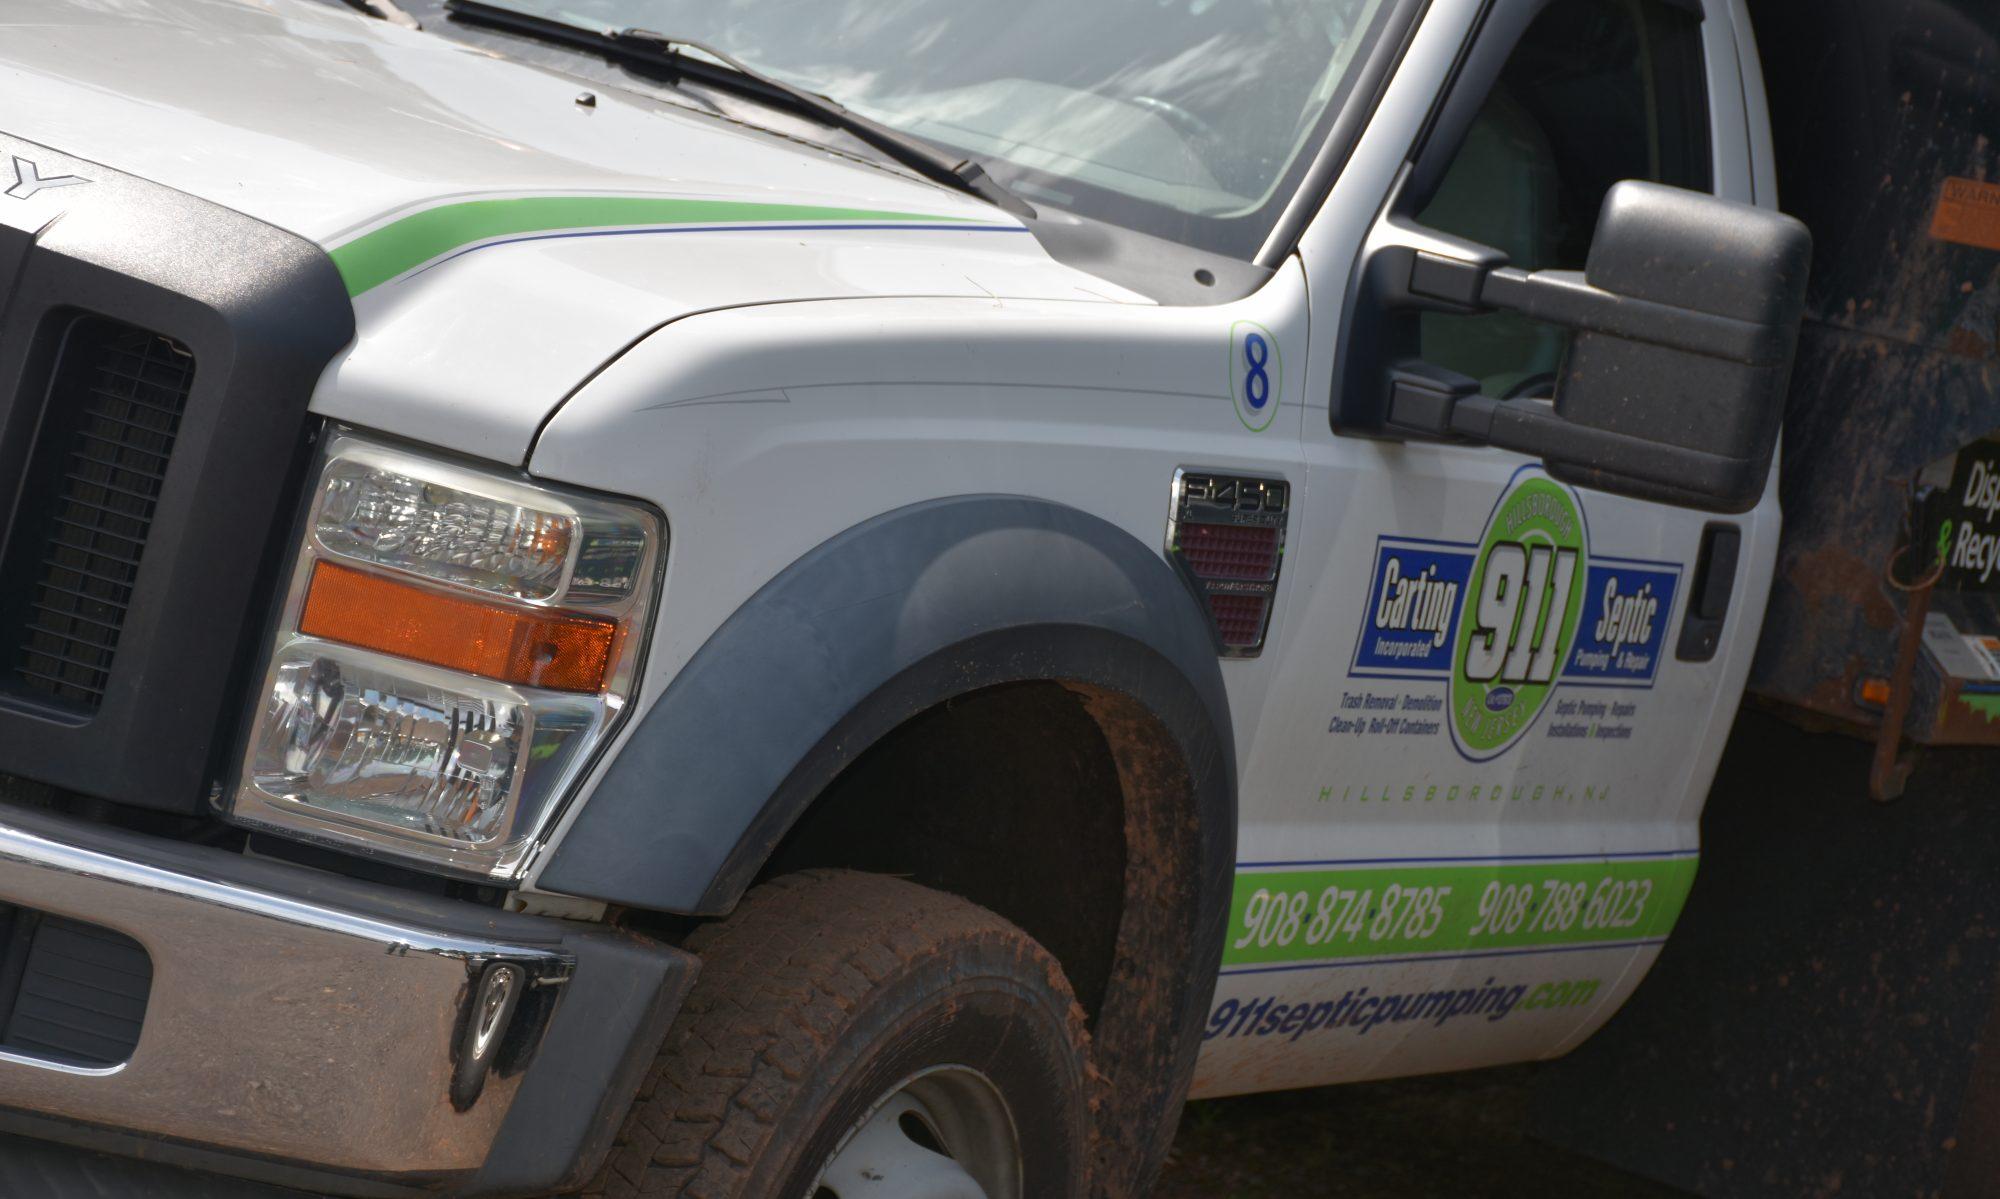 911 Septic Pumping & Carting